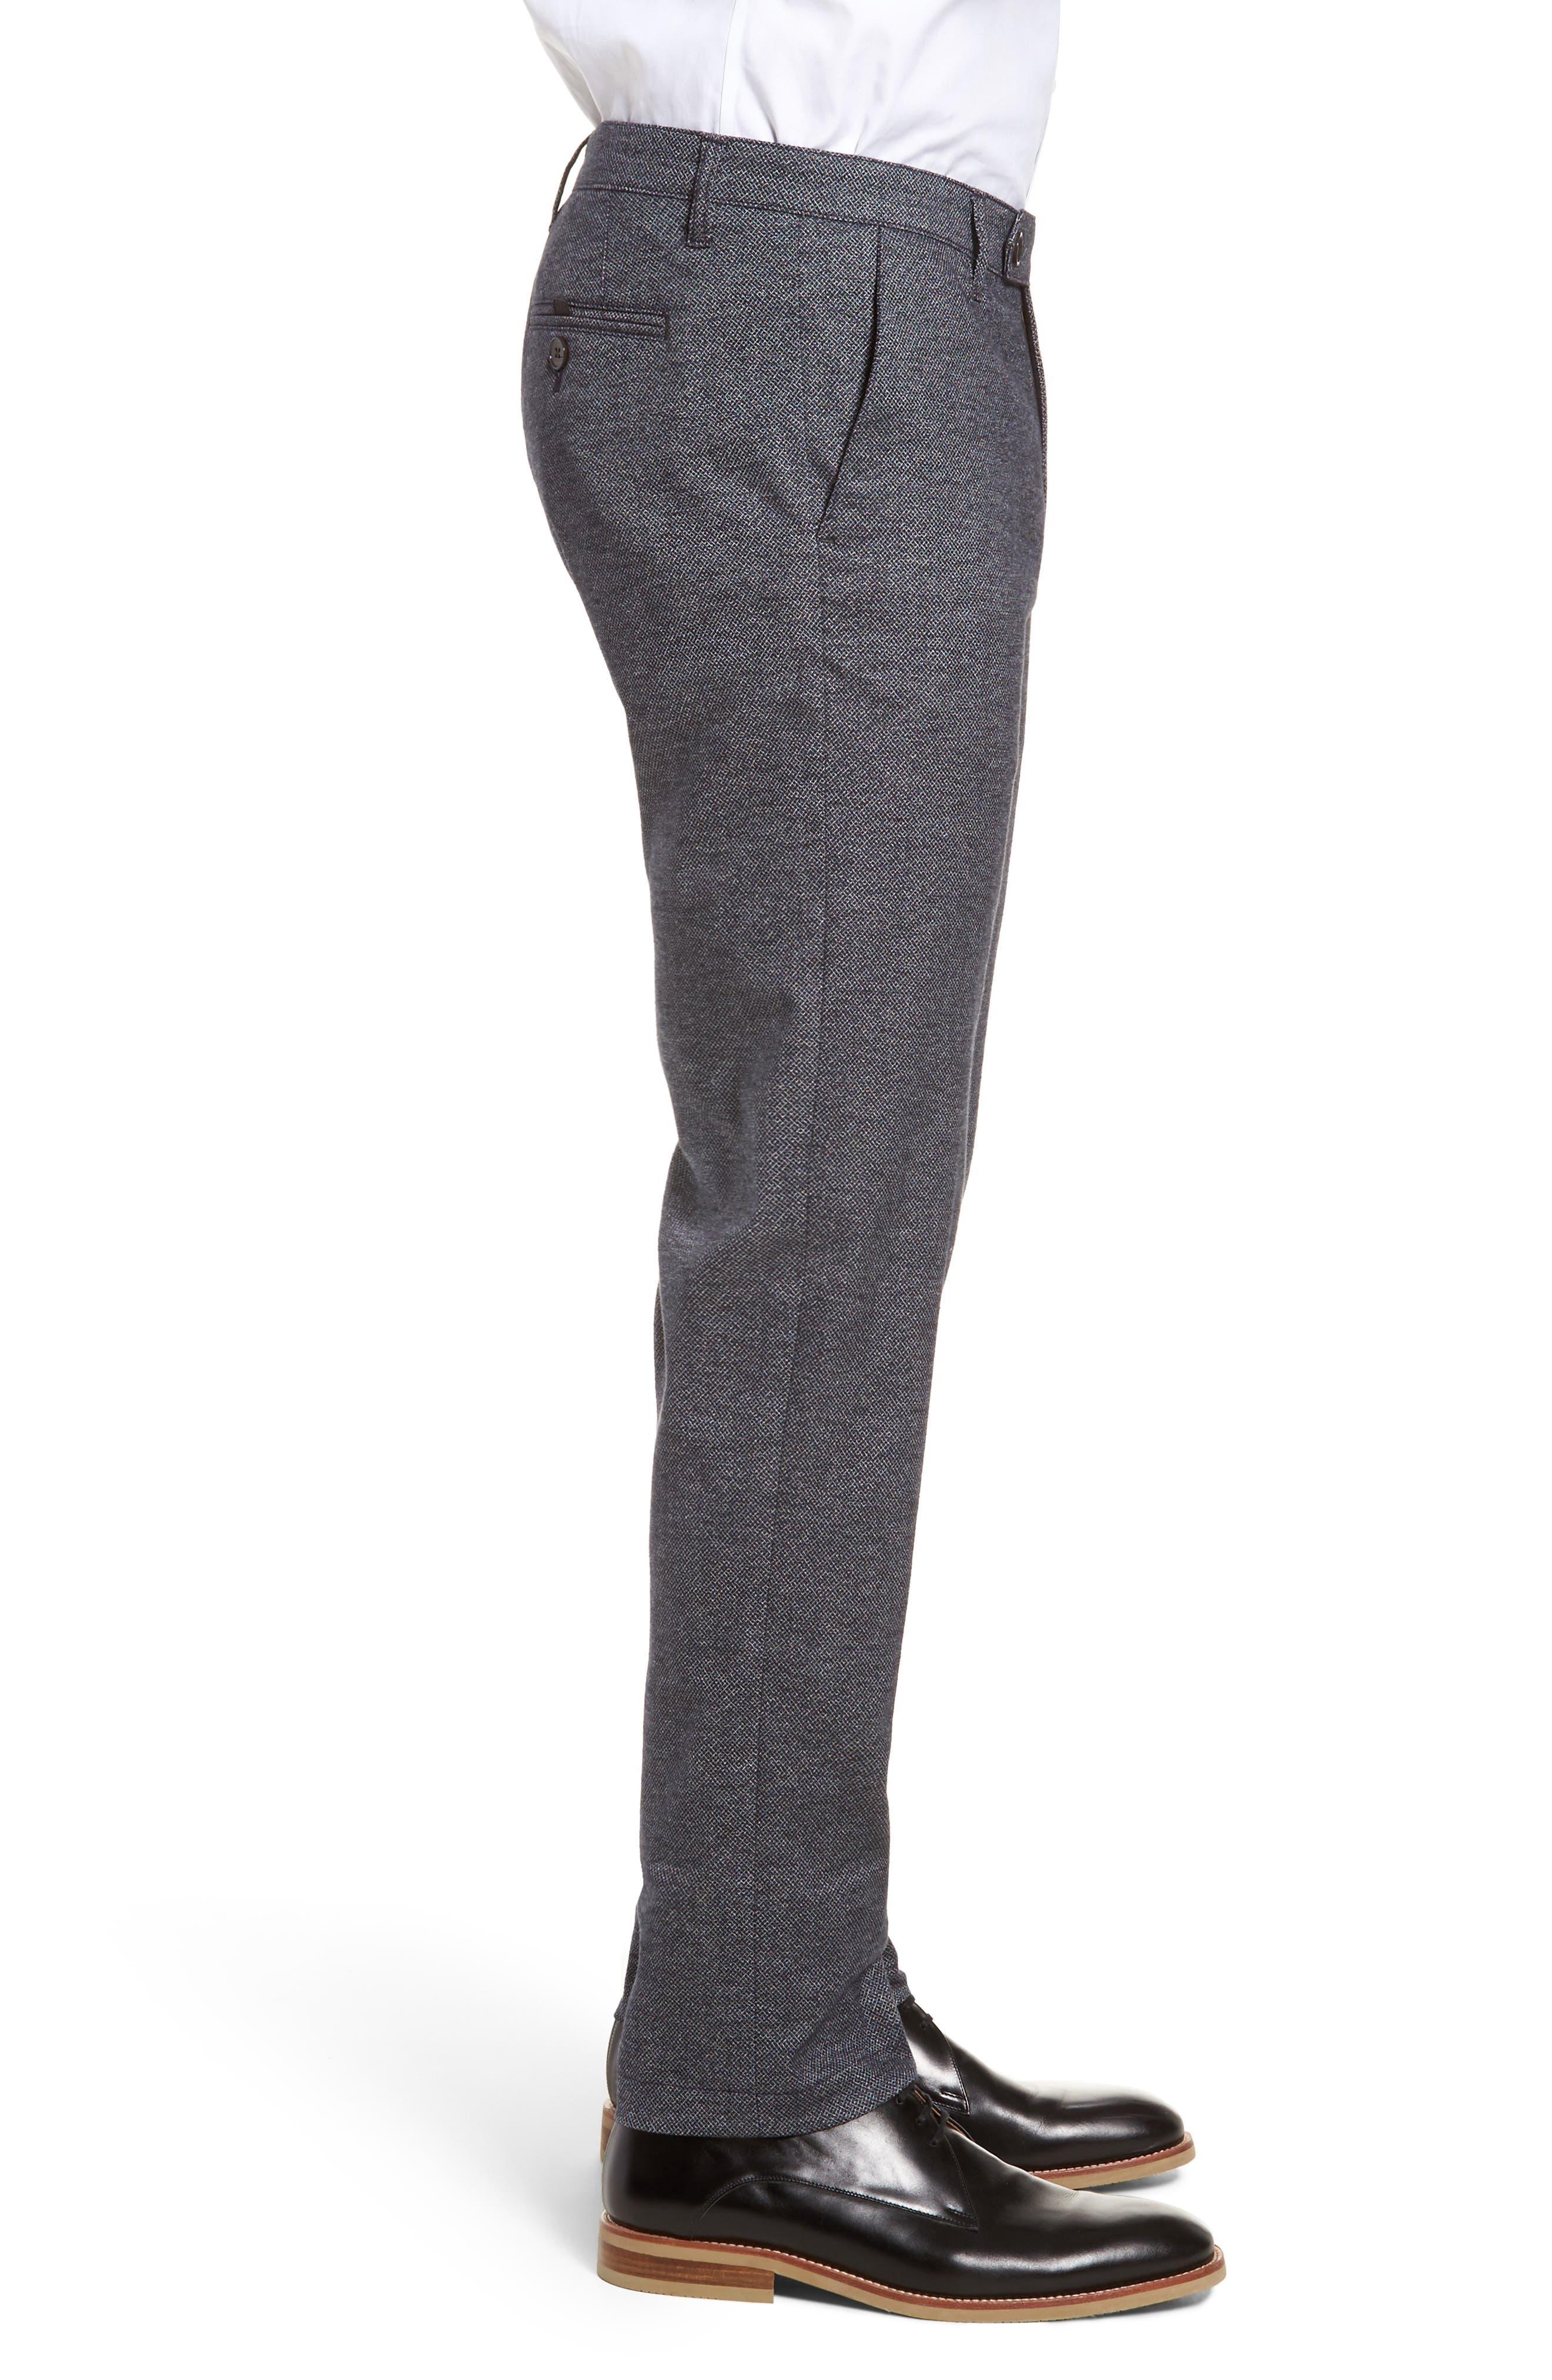 Pintztt Flat Front Stretch Solid Cotton Pants,                             Alternate thumbnail 3, color,                             Navy